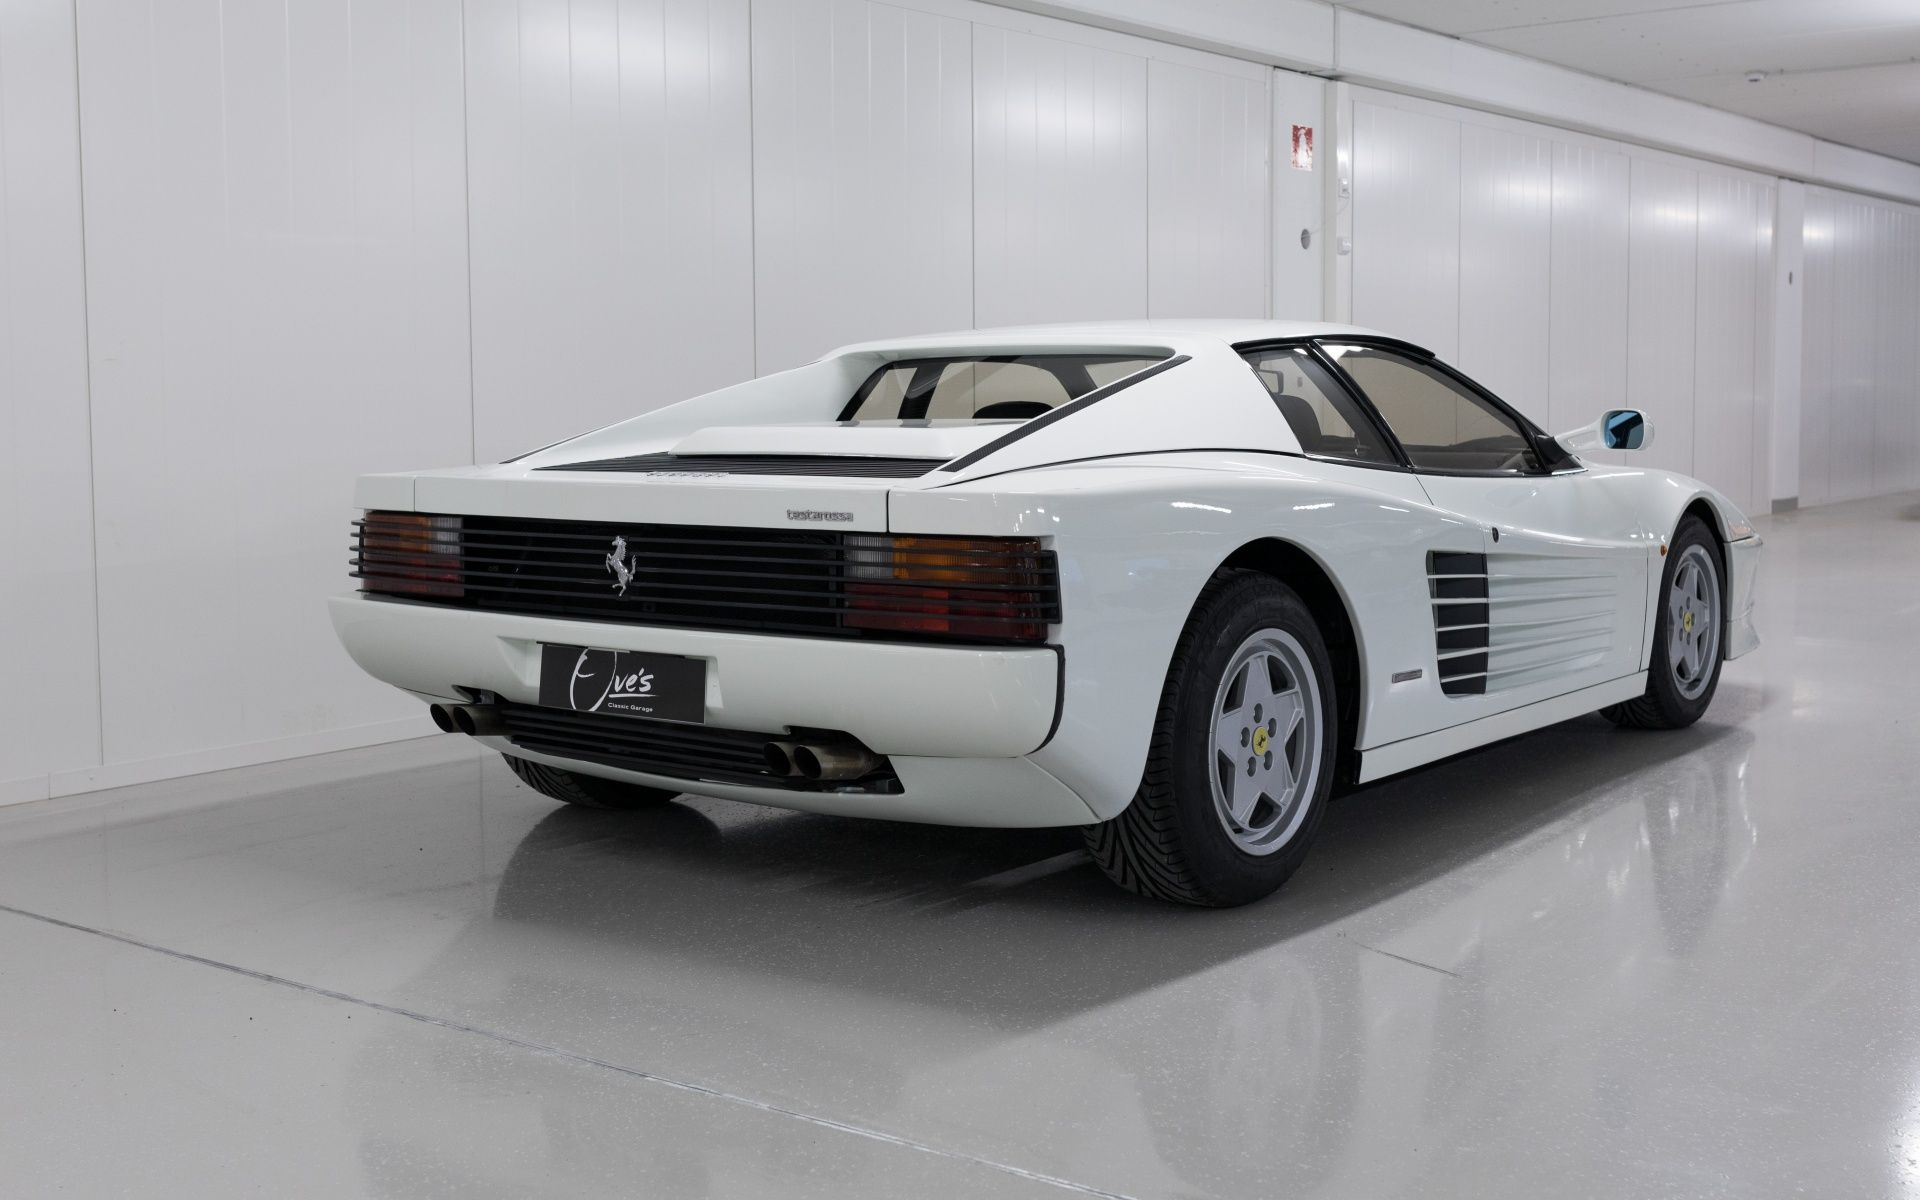 1990 Ferrari Testarossa Classic Driver Market Ferrari Testarossa Ferrari Ferrari Car